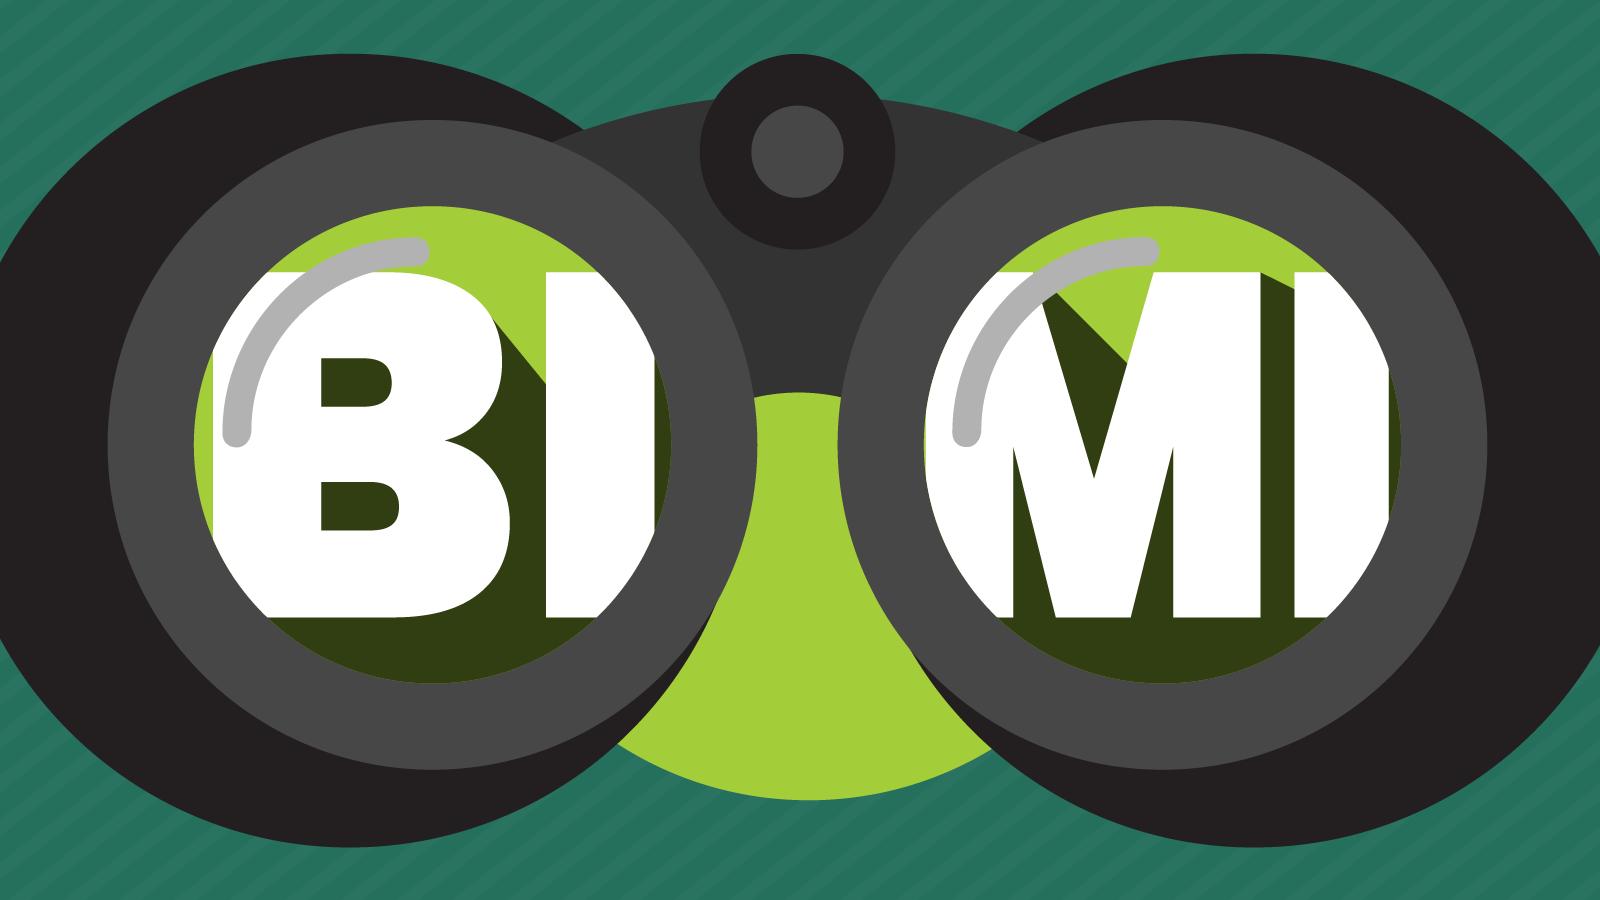 BIMI through the lenses of a binoculars